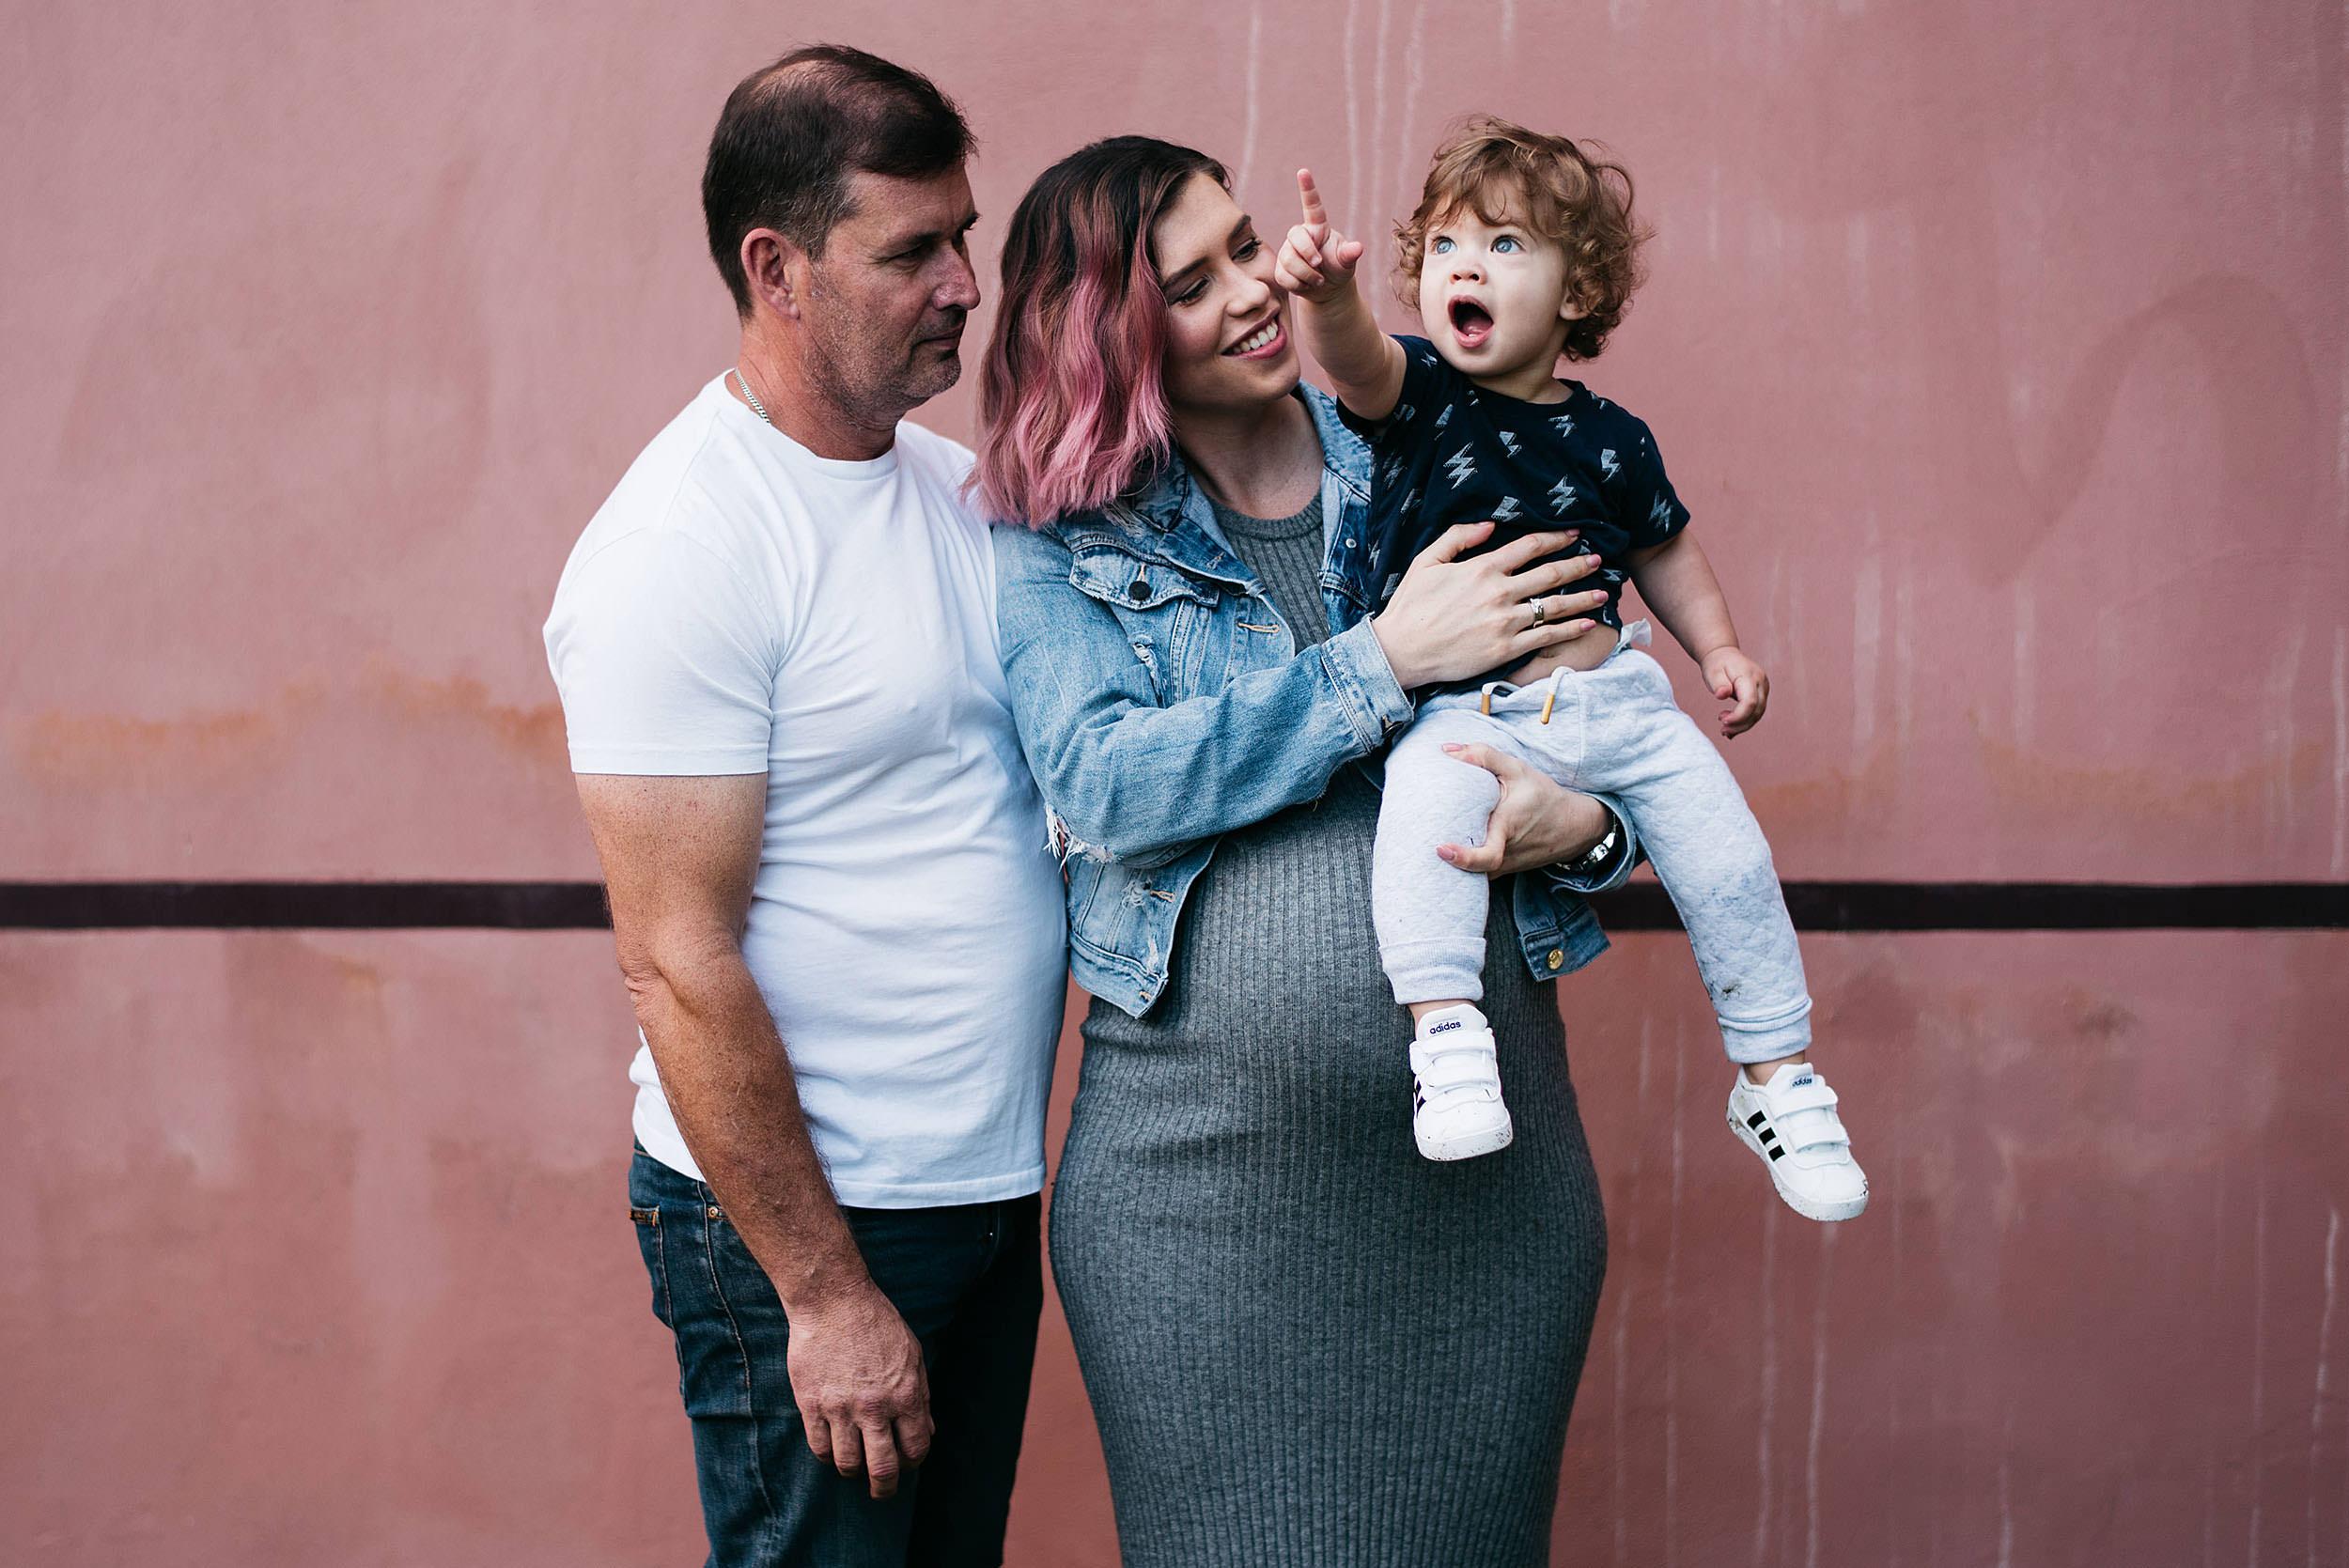 brisbane-family-portrait-photographer-11.jpg